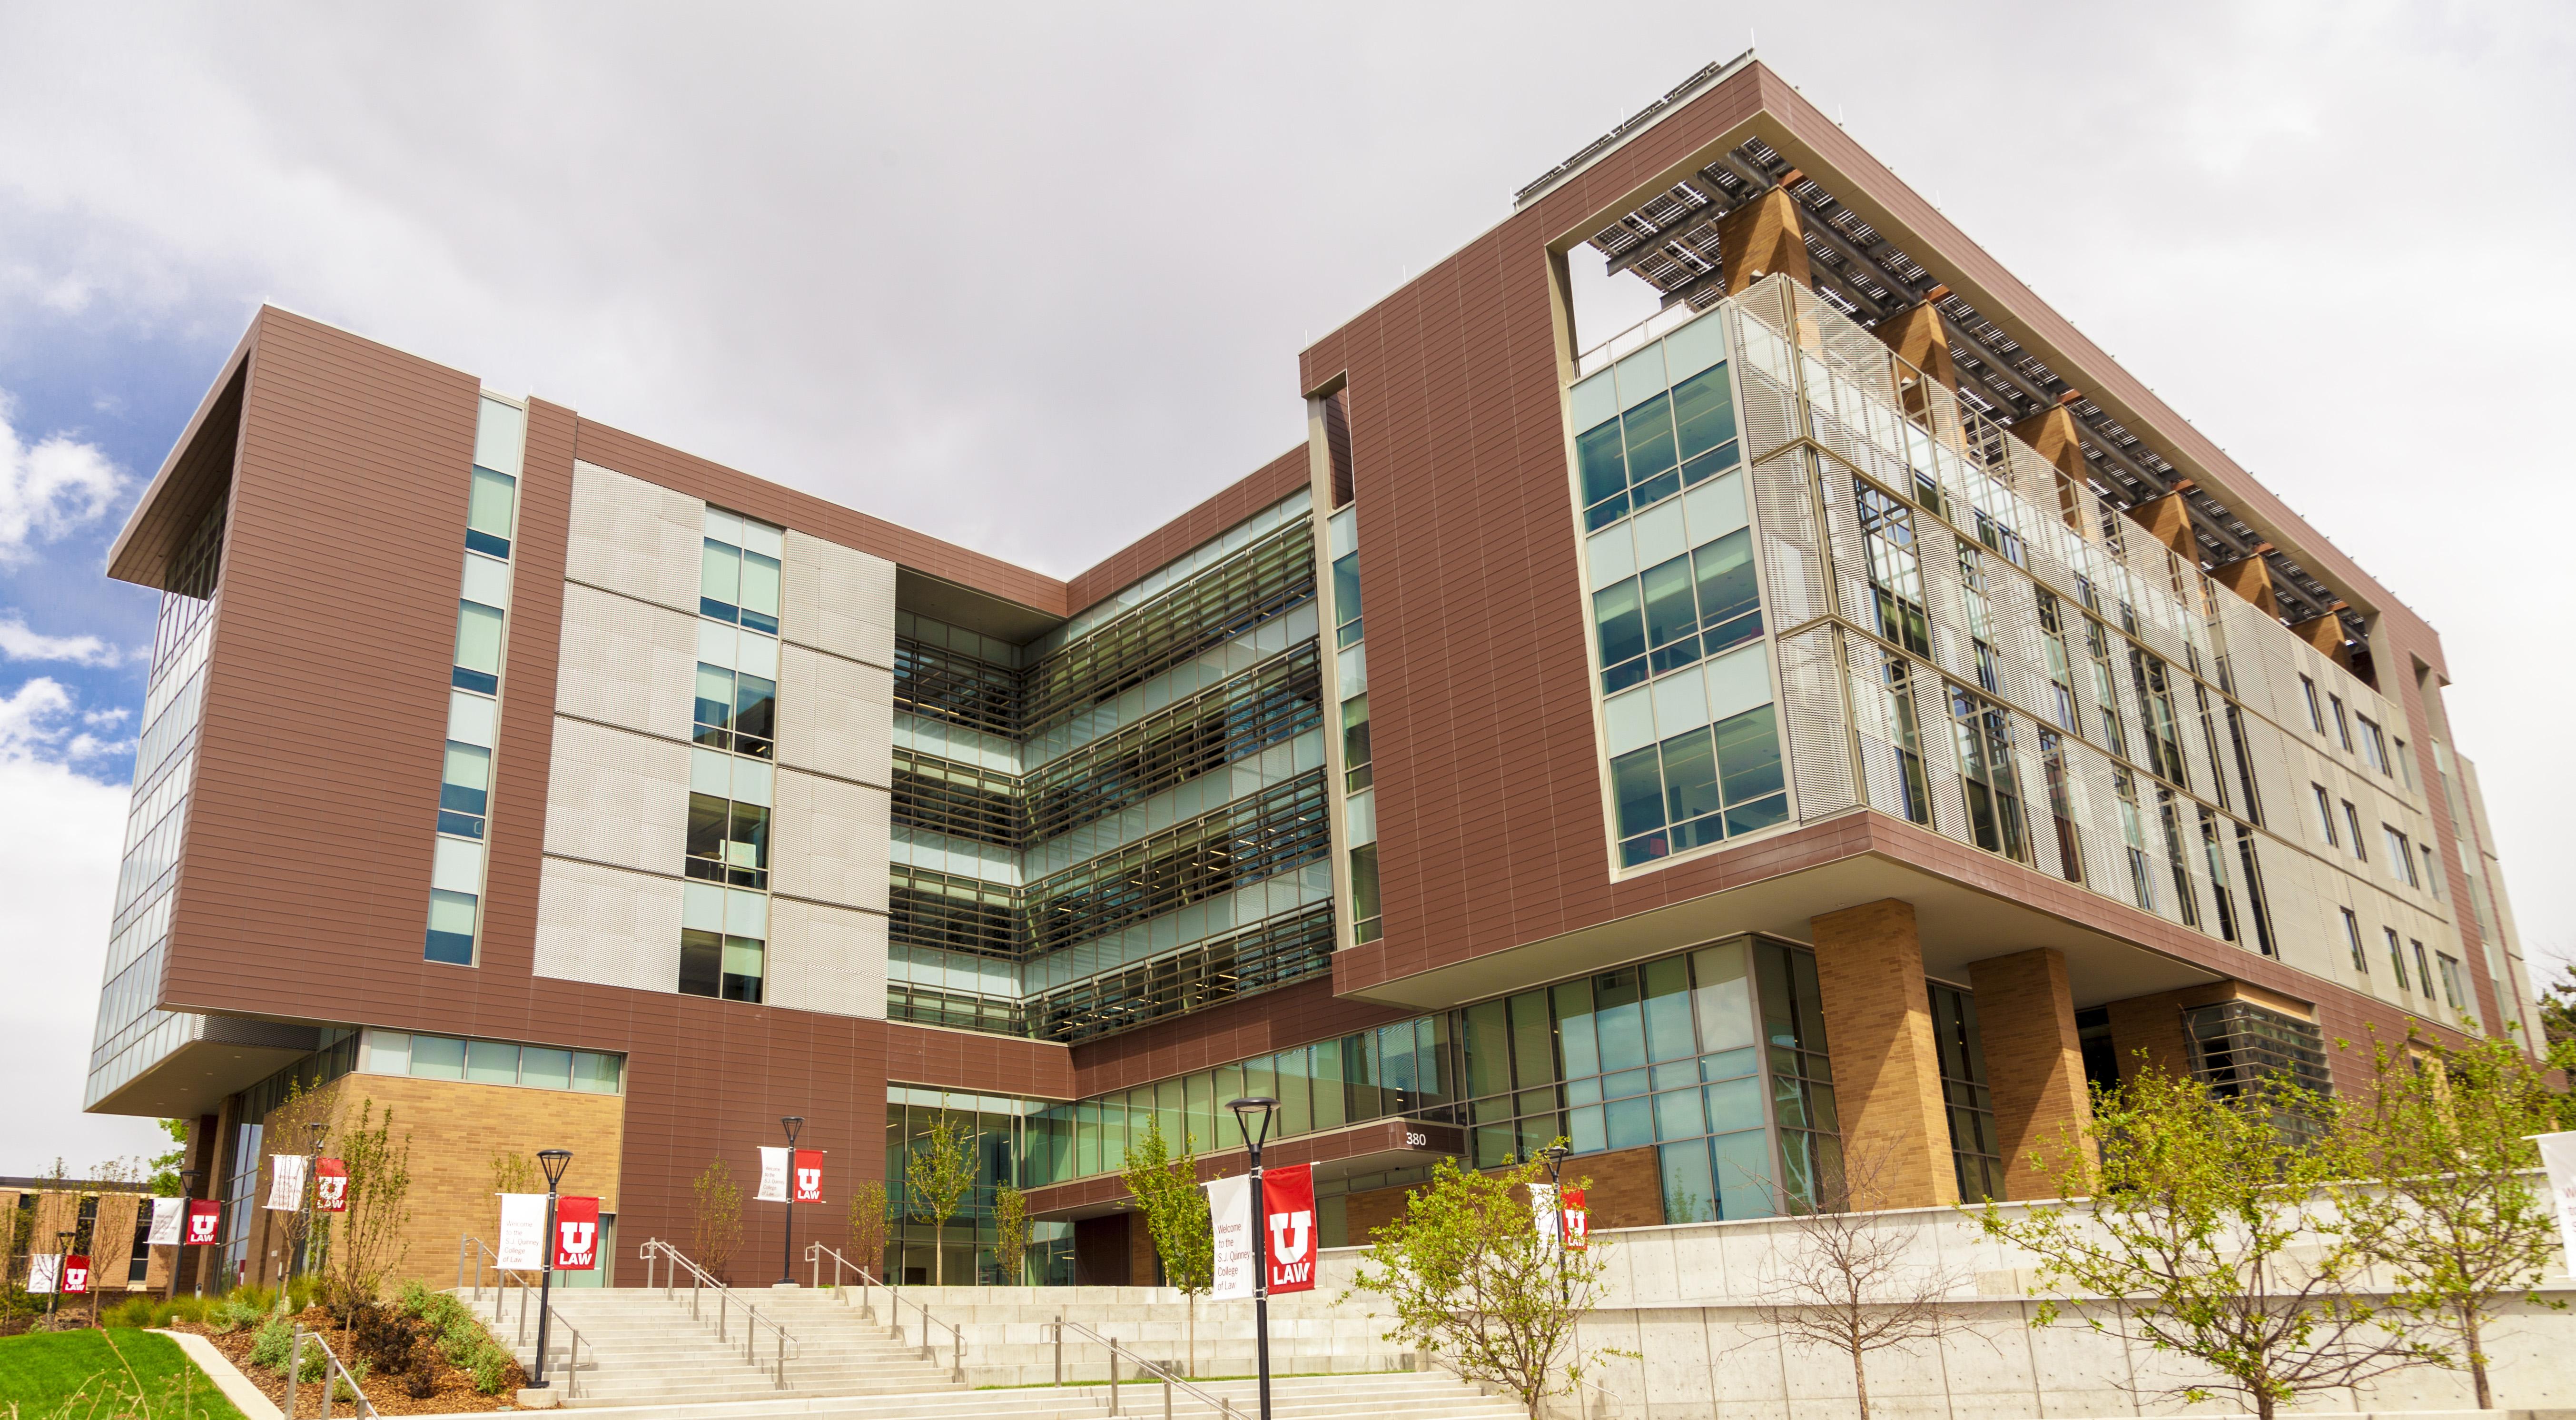 university of utah student body